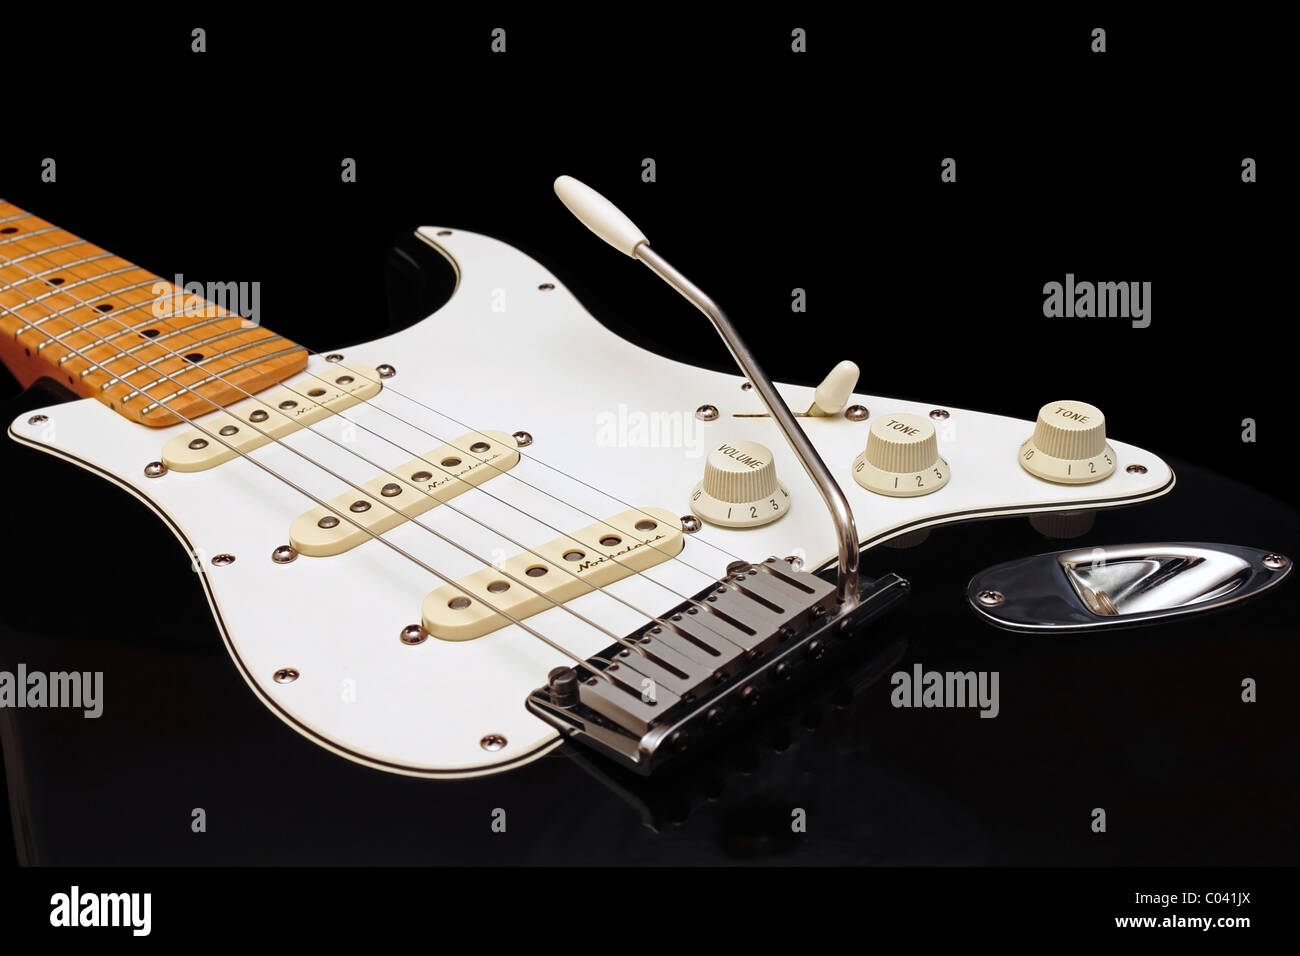 Charmant Fender Pickup Verkabelung Fotos - Elektrische Schaltplan ...